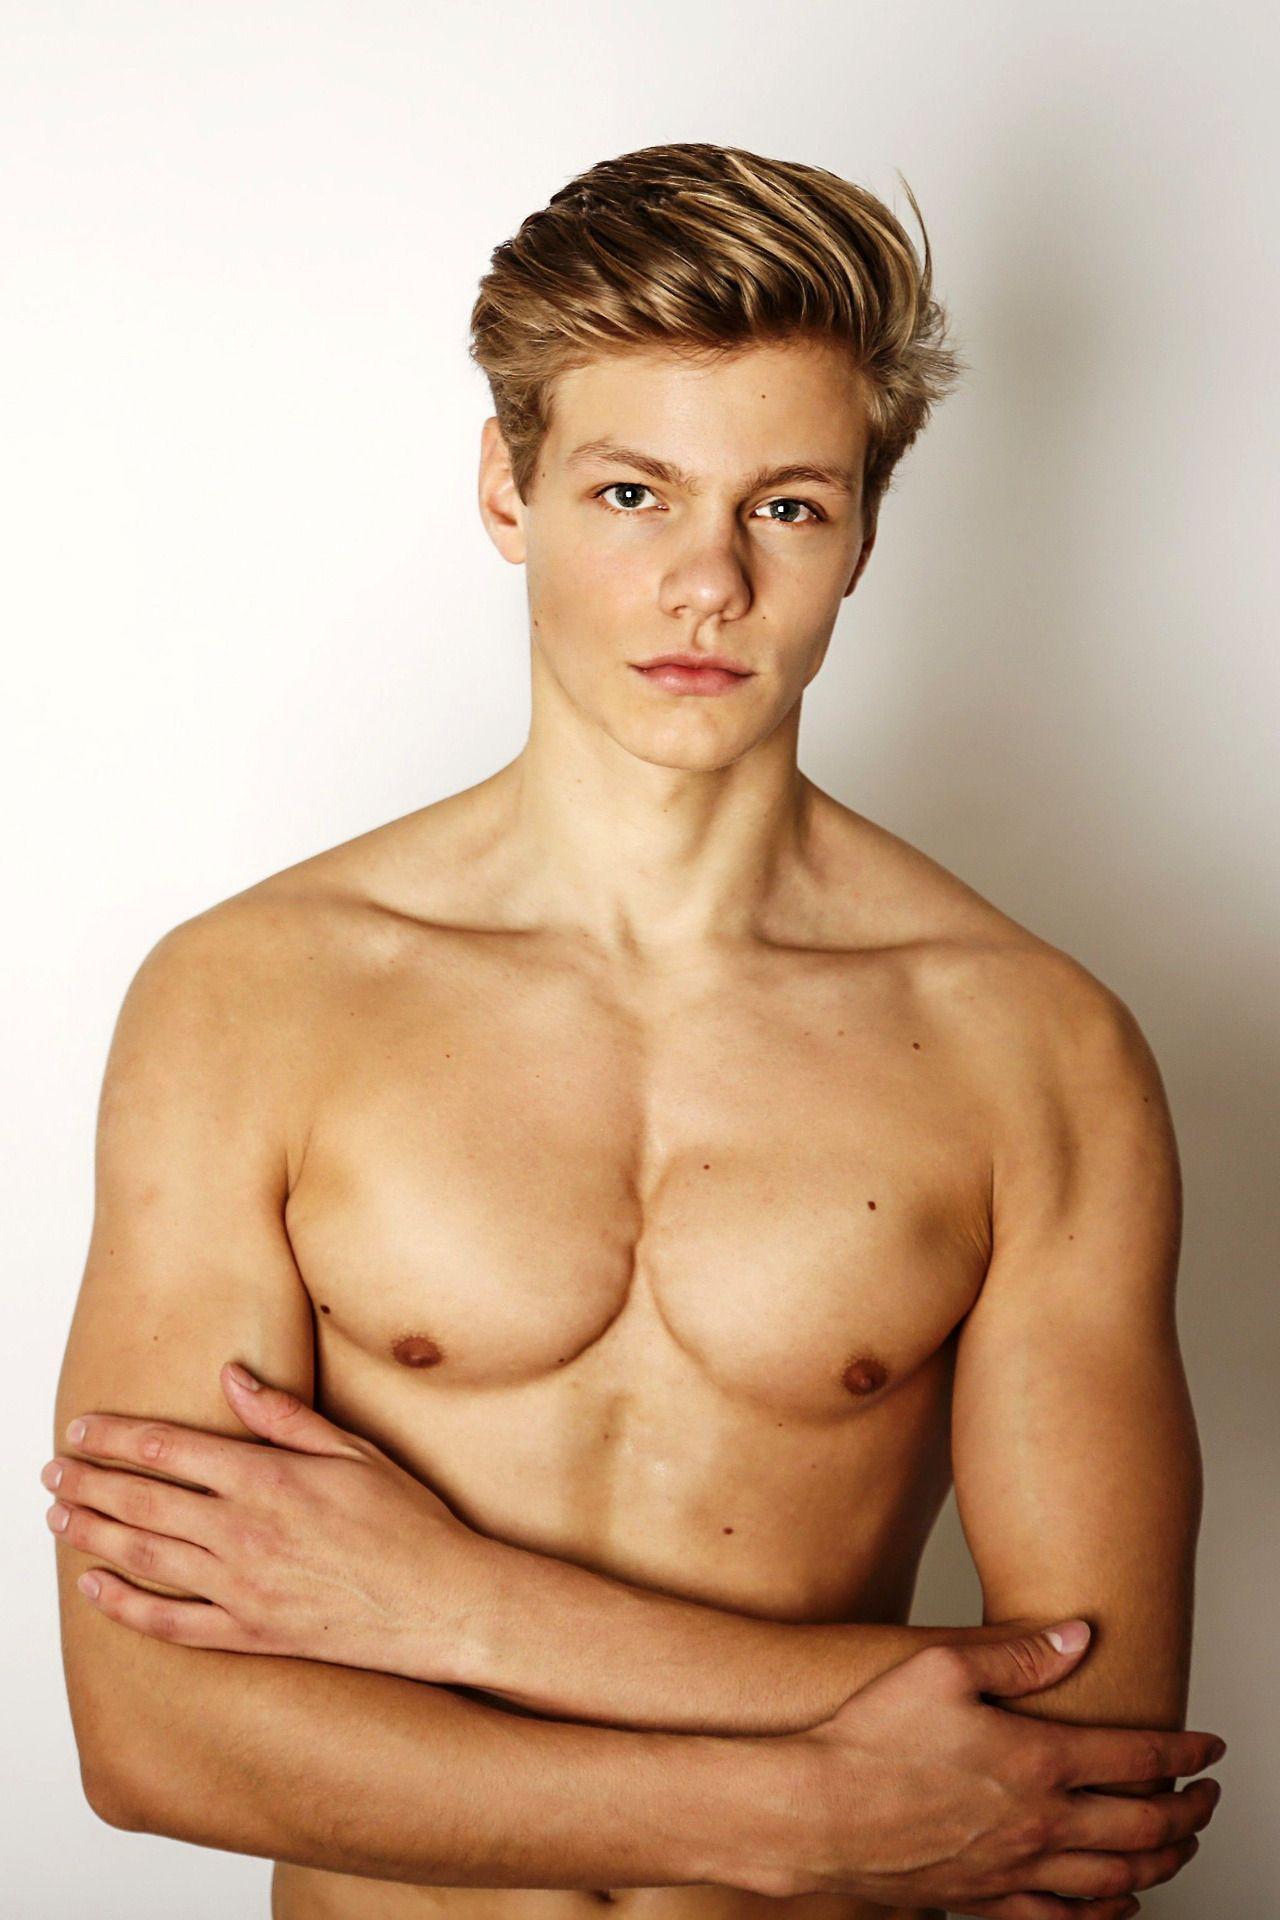 florian Gay boy model